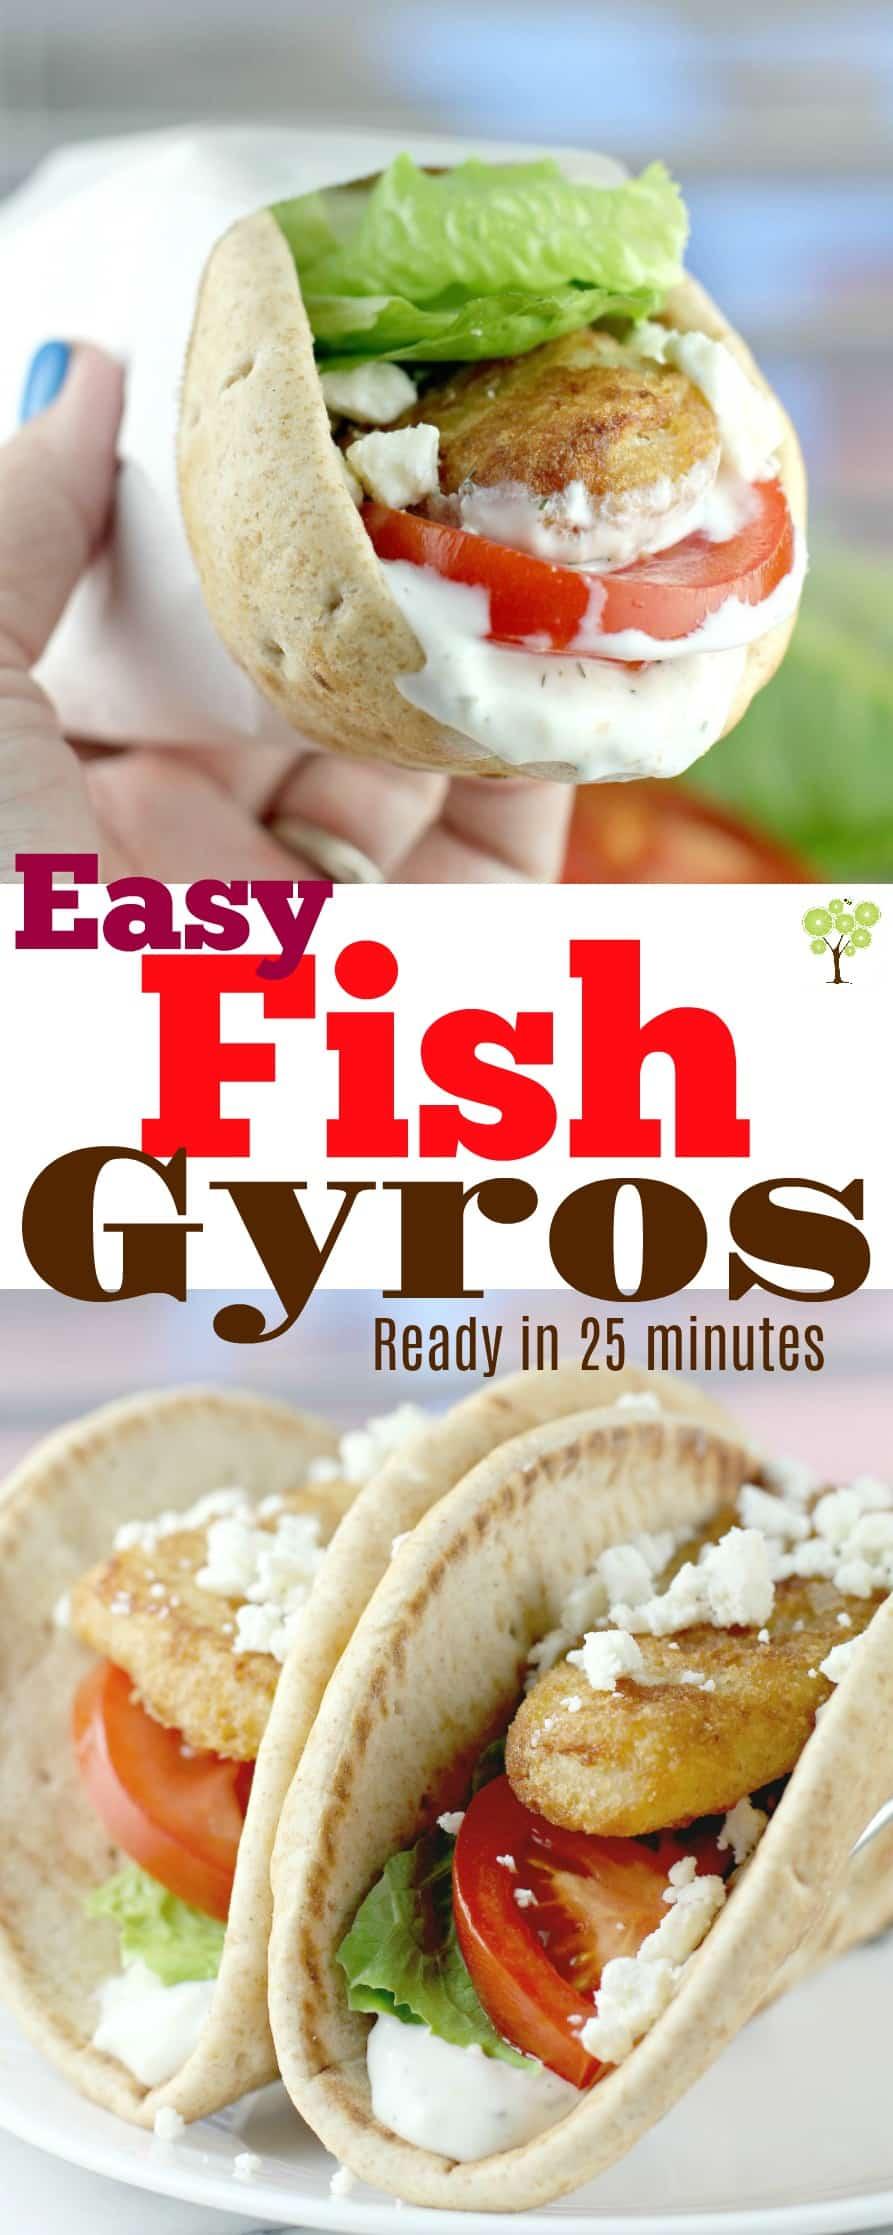 Easy Fish Gyros #GortonsMealTime #TrustGortons #food #Lent #recipe #seafood #quickdinner